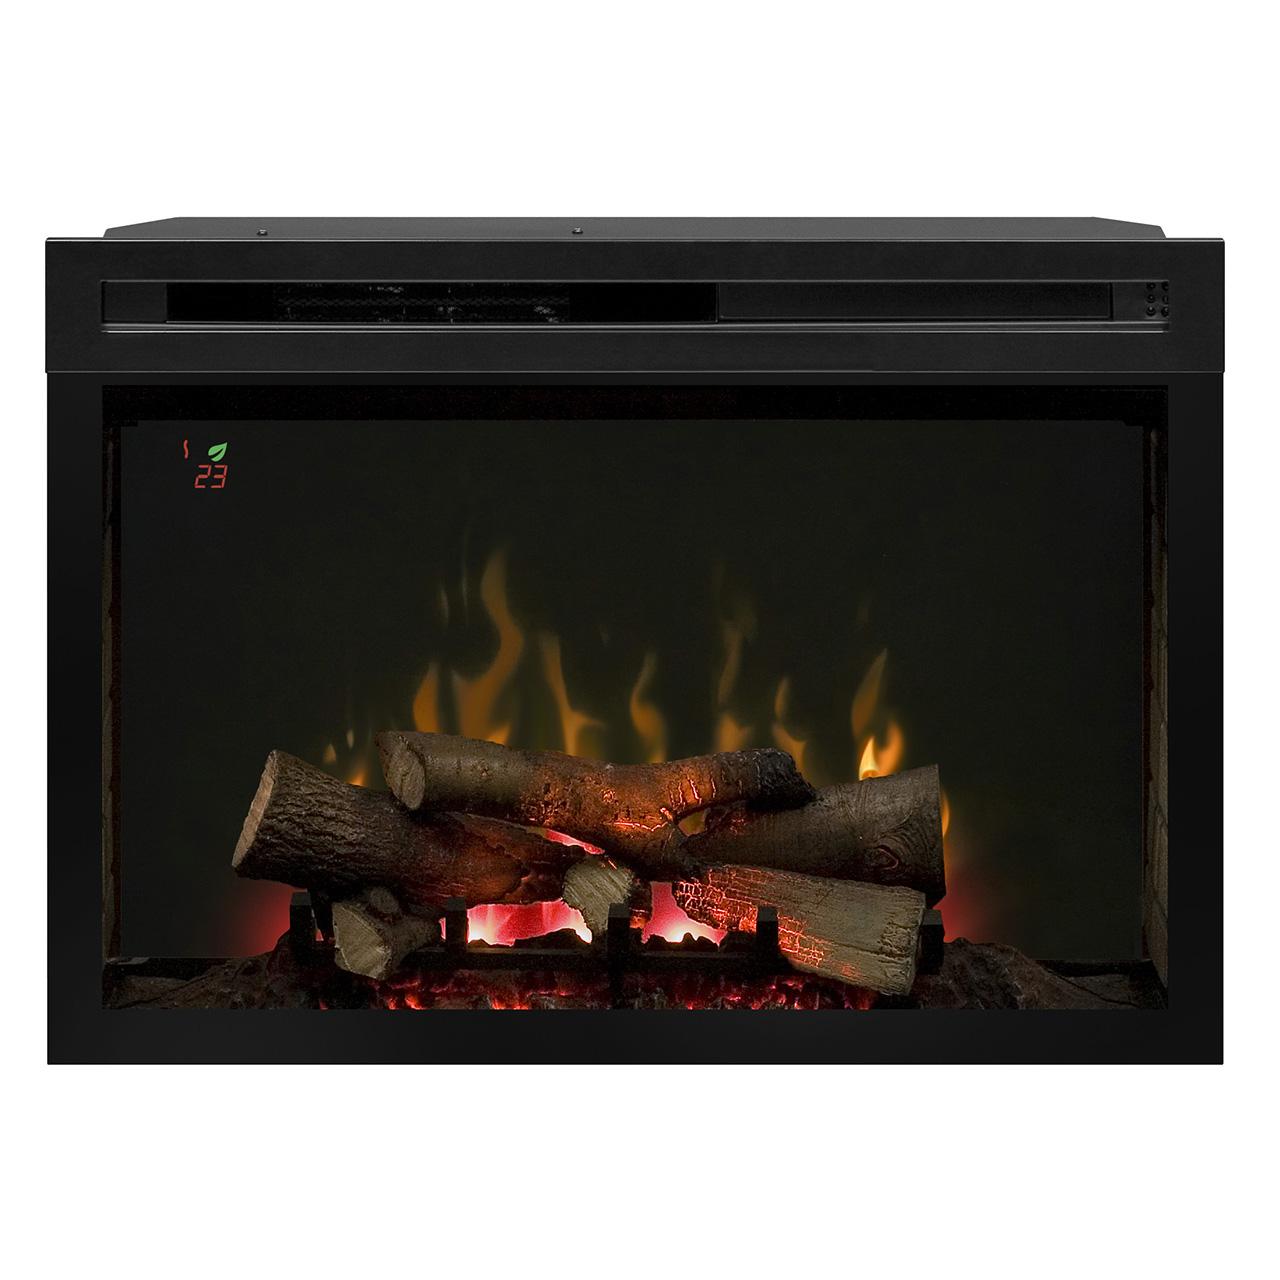 Dimplex PF3033HL Electric Fireplace Insert